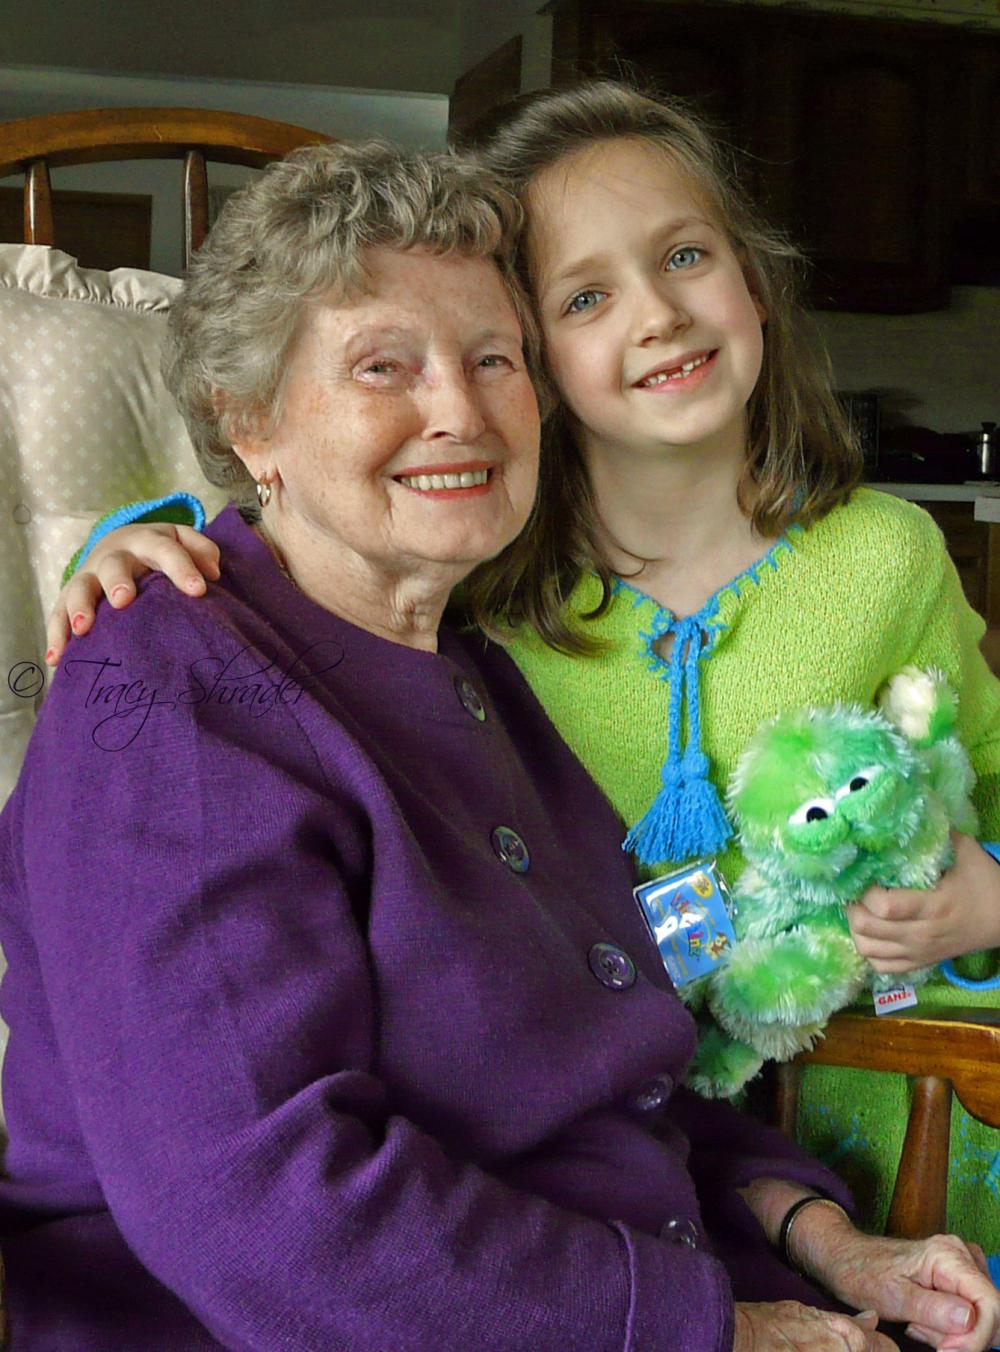 R.I.P. Aunt Bernardine, 1925-2012